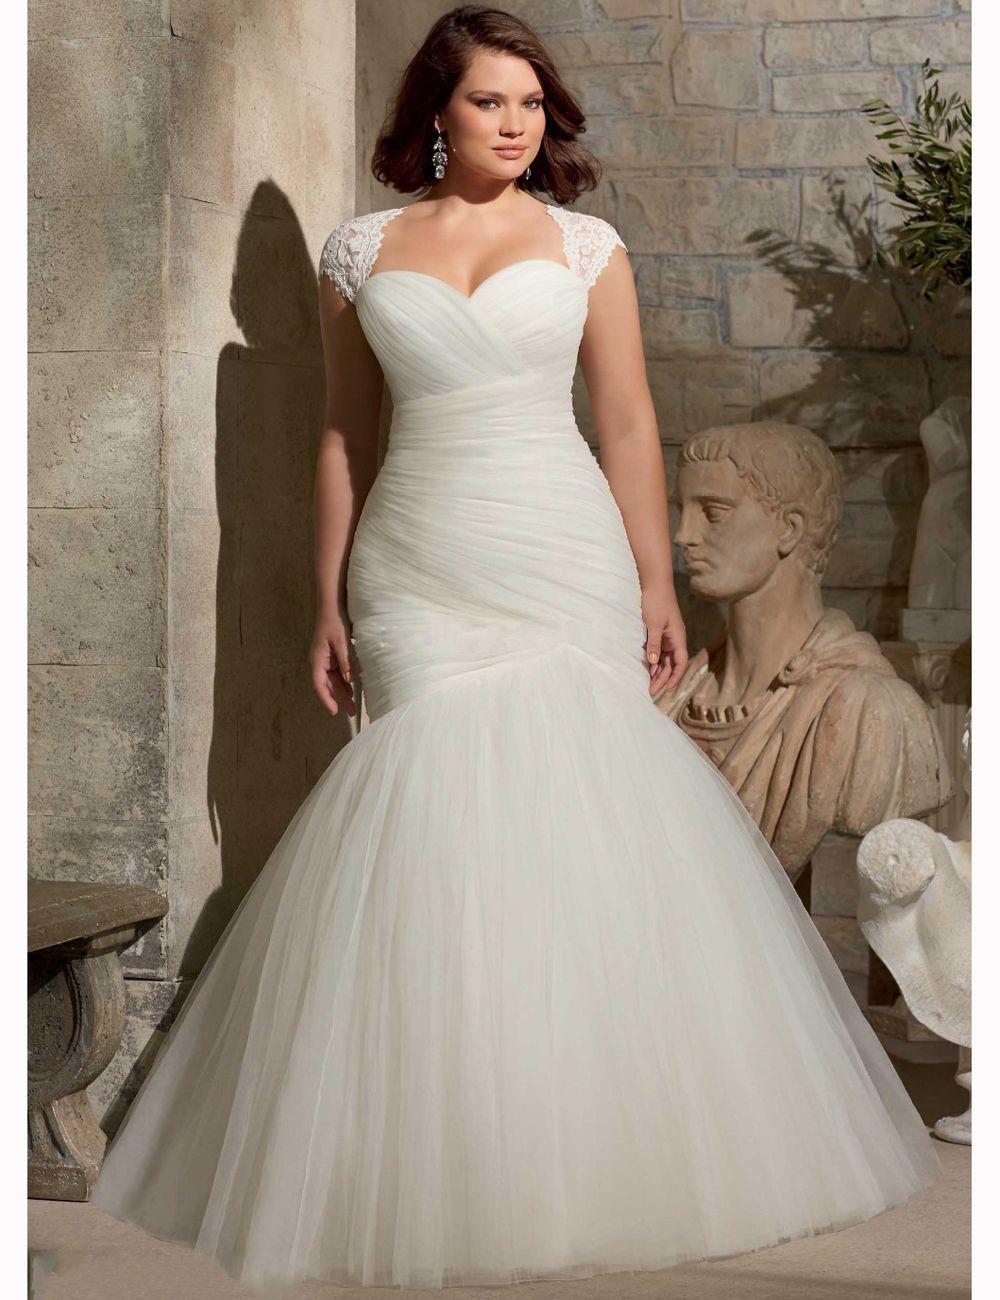 Big Mermaid Wedding Dresses with Tulle